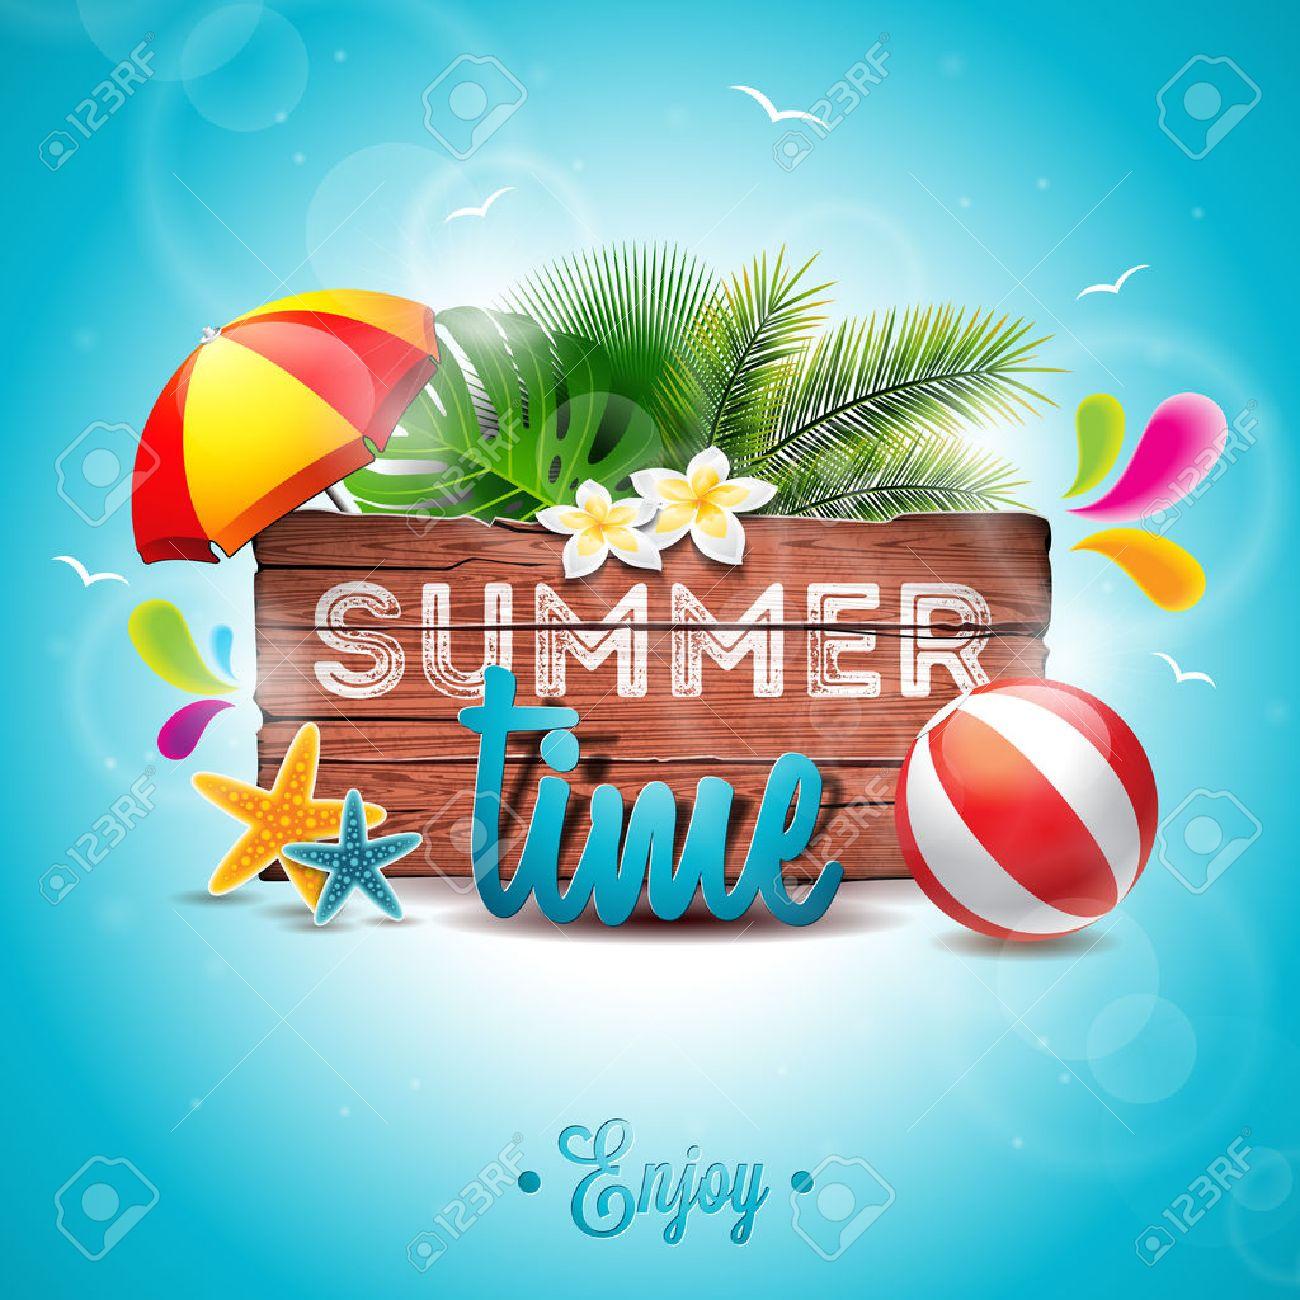 Summer Holidays Beach Summer Vacation Violet Wandschild Orteils-Sandale en Bois